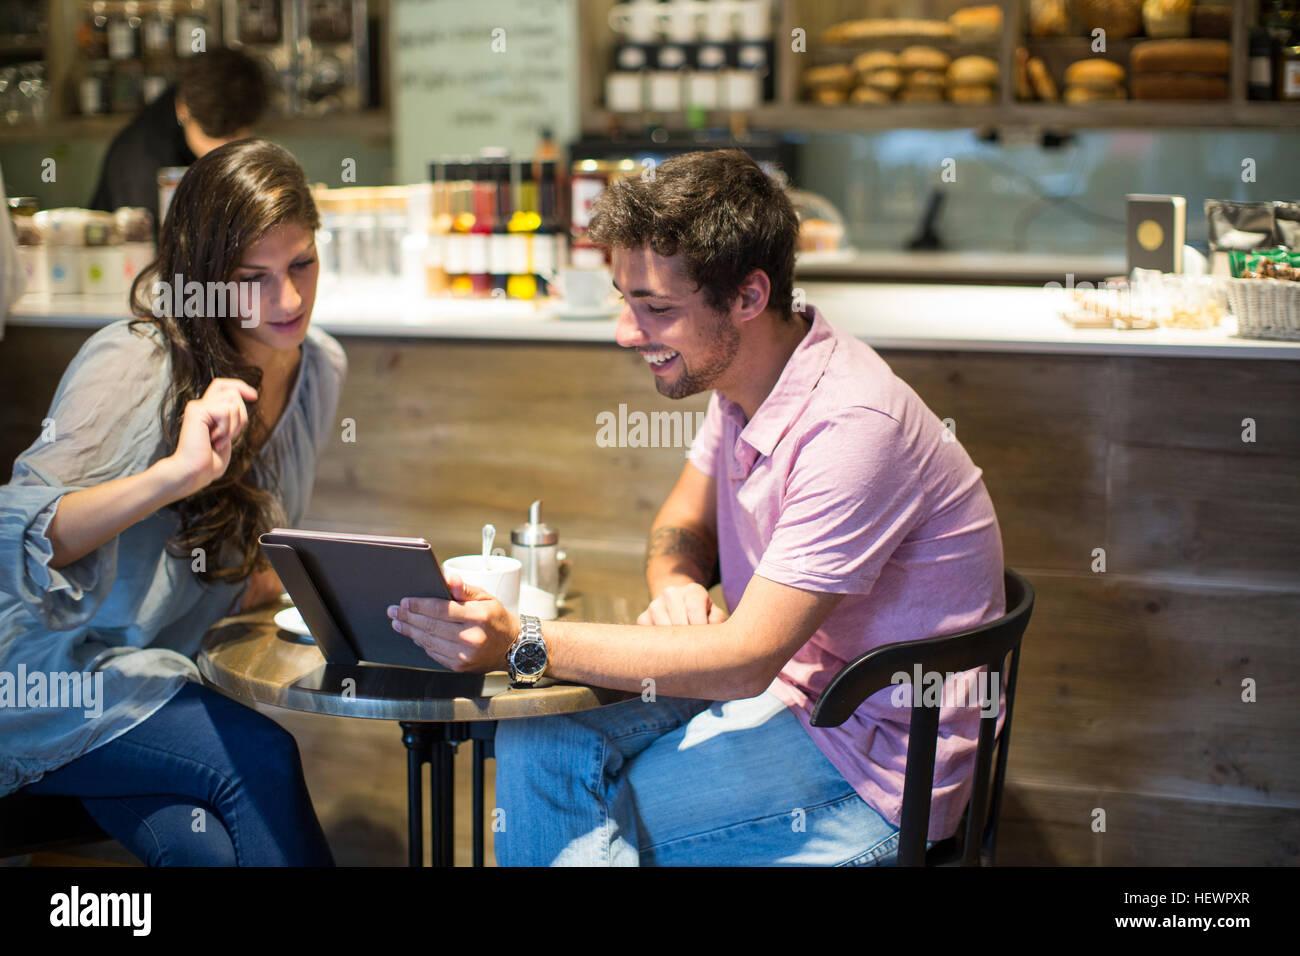 Junges Paar im Café Blick auf digital-Tablette Stockbild